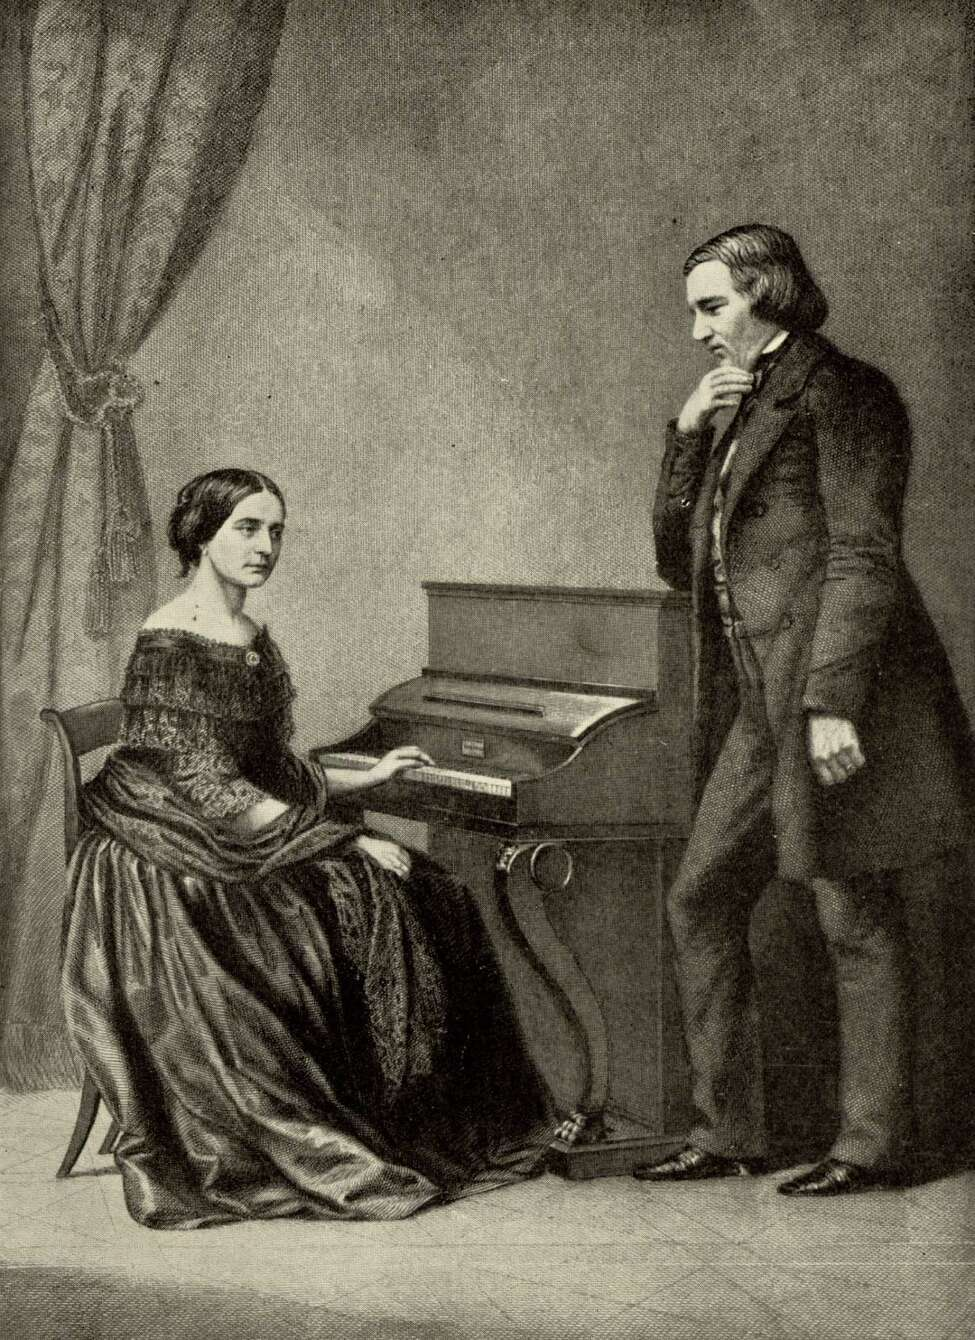 Clara Schumann at piano, with husband Robert (public domain)